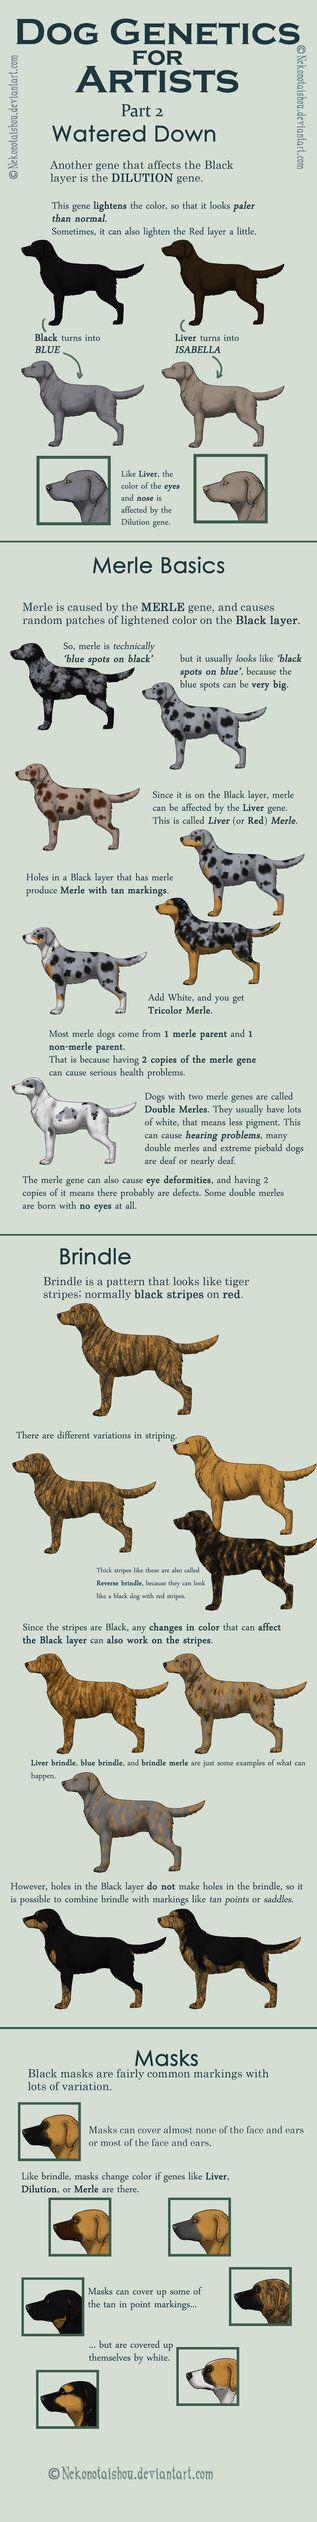 Pin By Maddison Park On Art Dog Anatomy Dog Infographic Dog Drawing